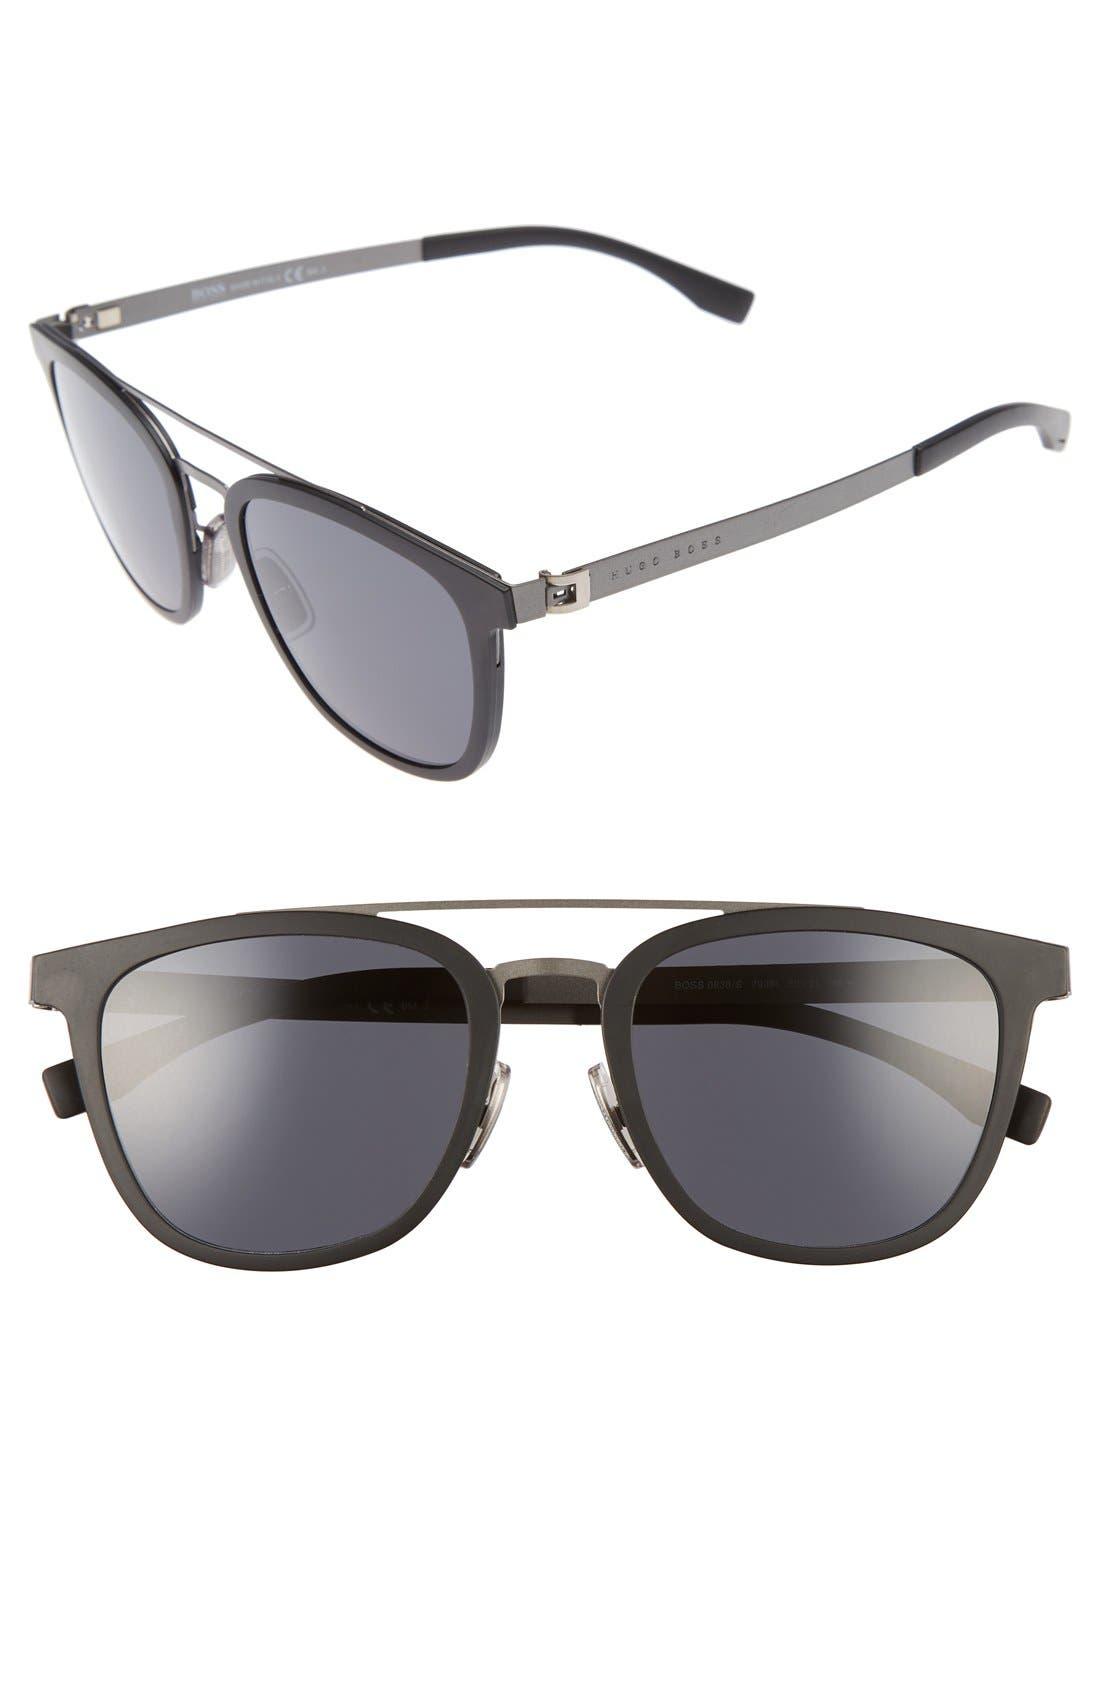 838/S 52mm Sunglasses,                             Main thumbnail 1, color,                             002